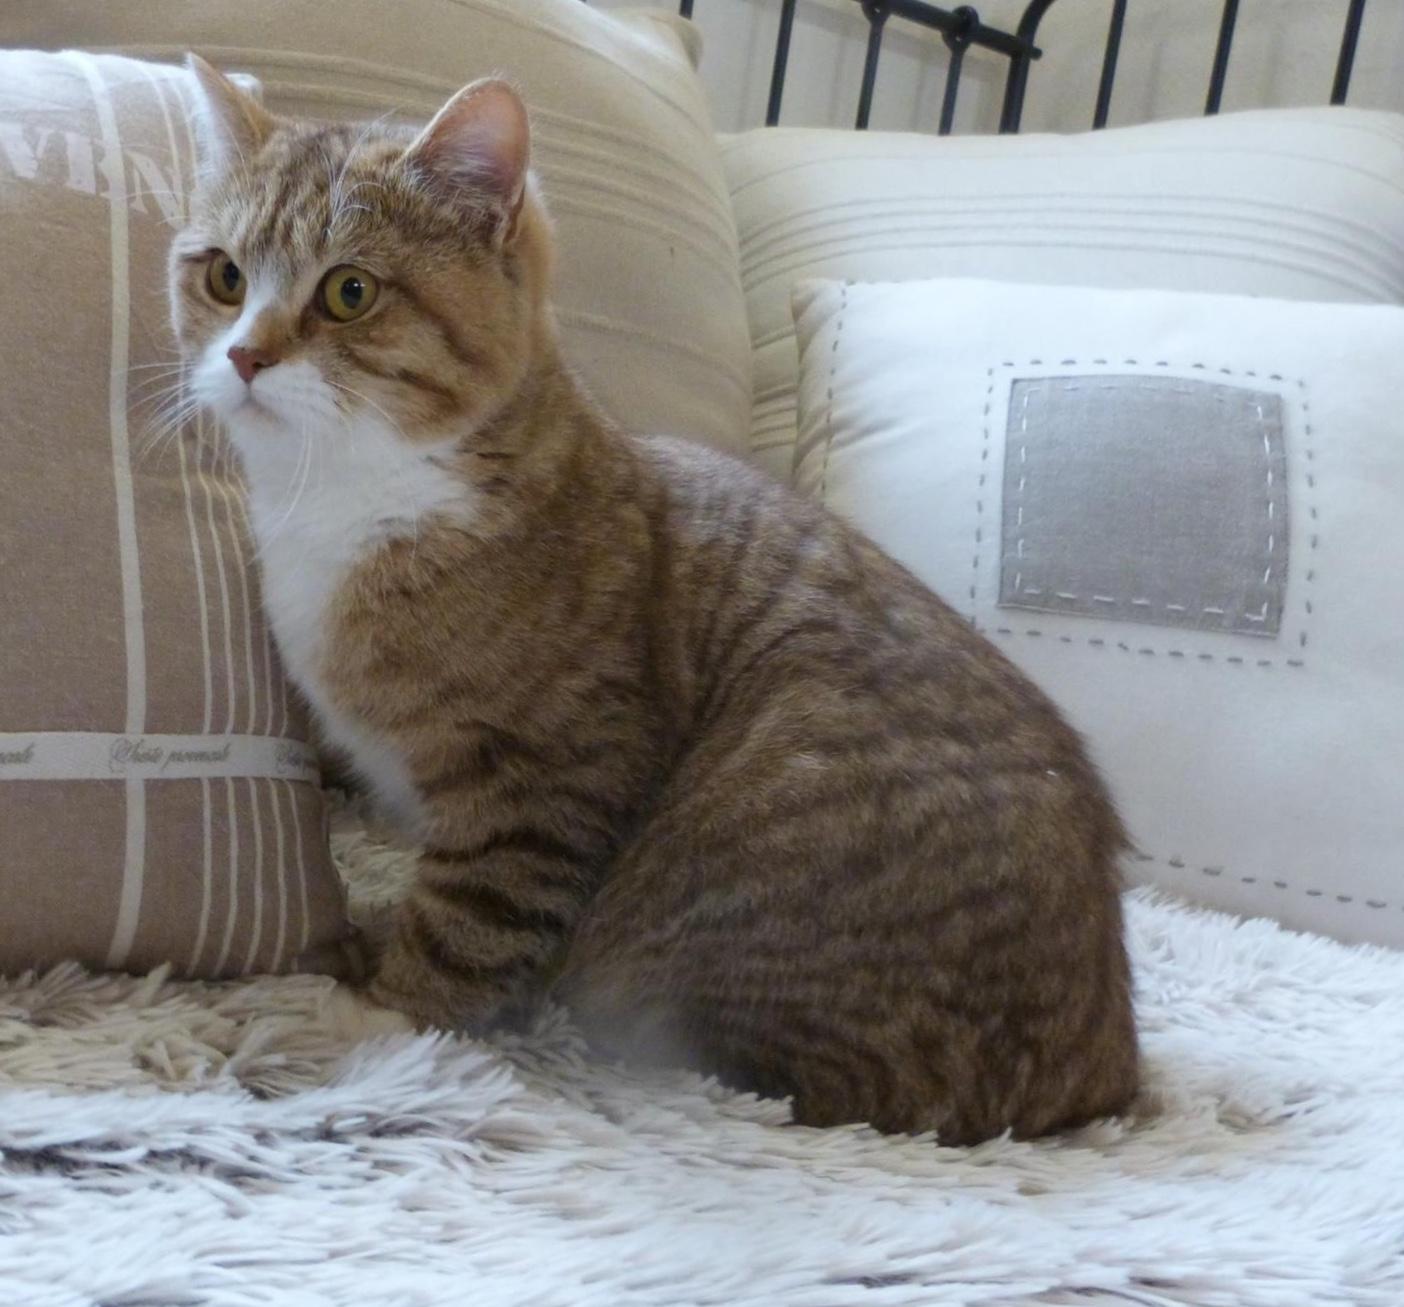 elevage du coeur des terres eleveur de chats british shorthair et longhair. Black Bedroom Furniture Sets. Home Design Ideas